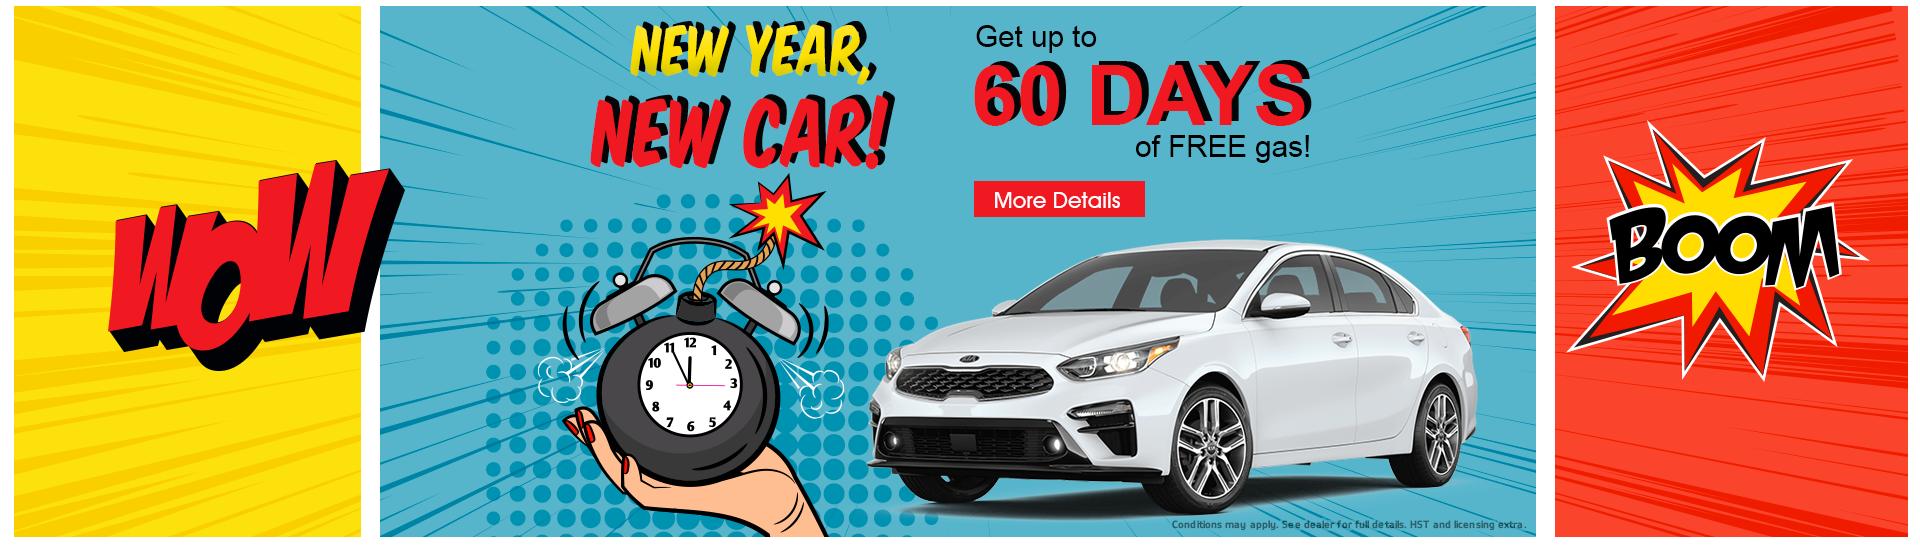 New Year, New Car!